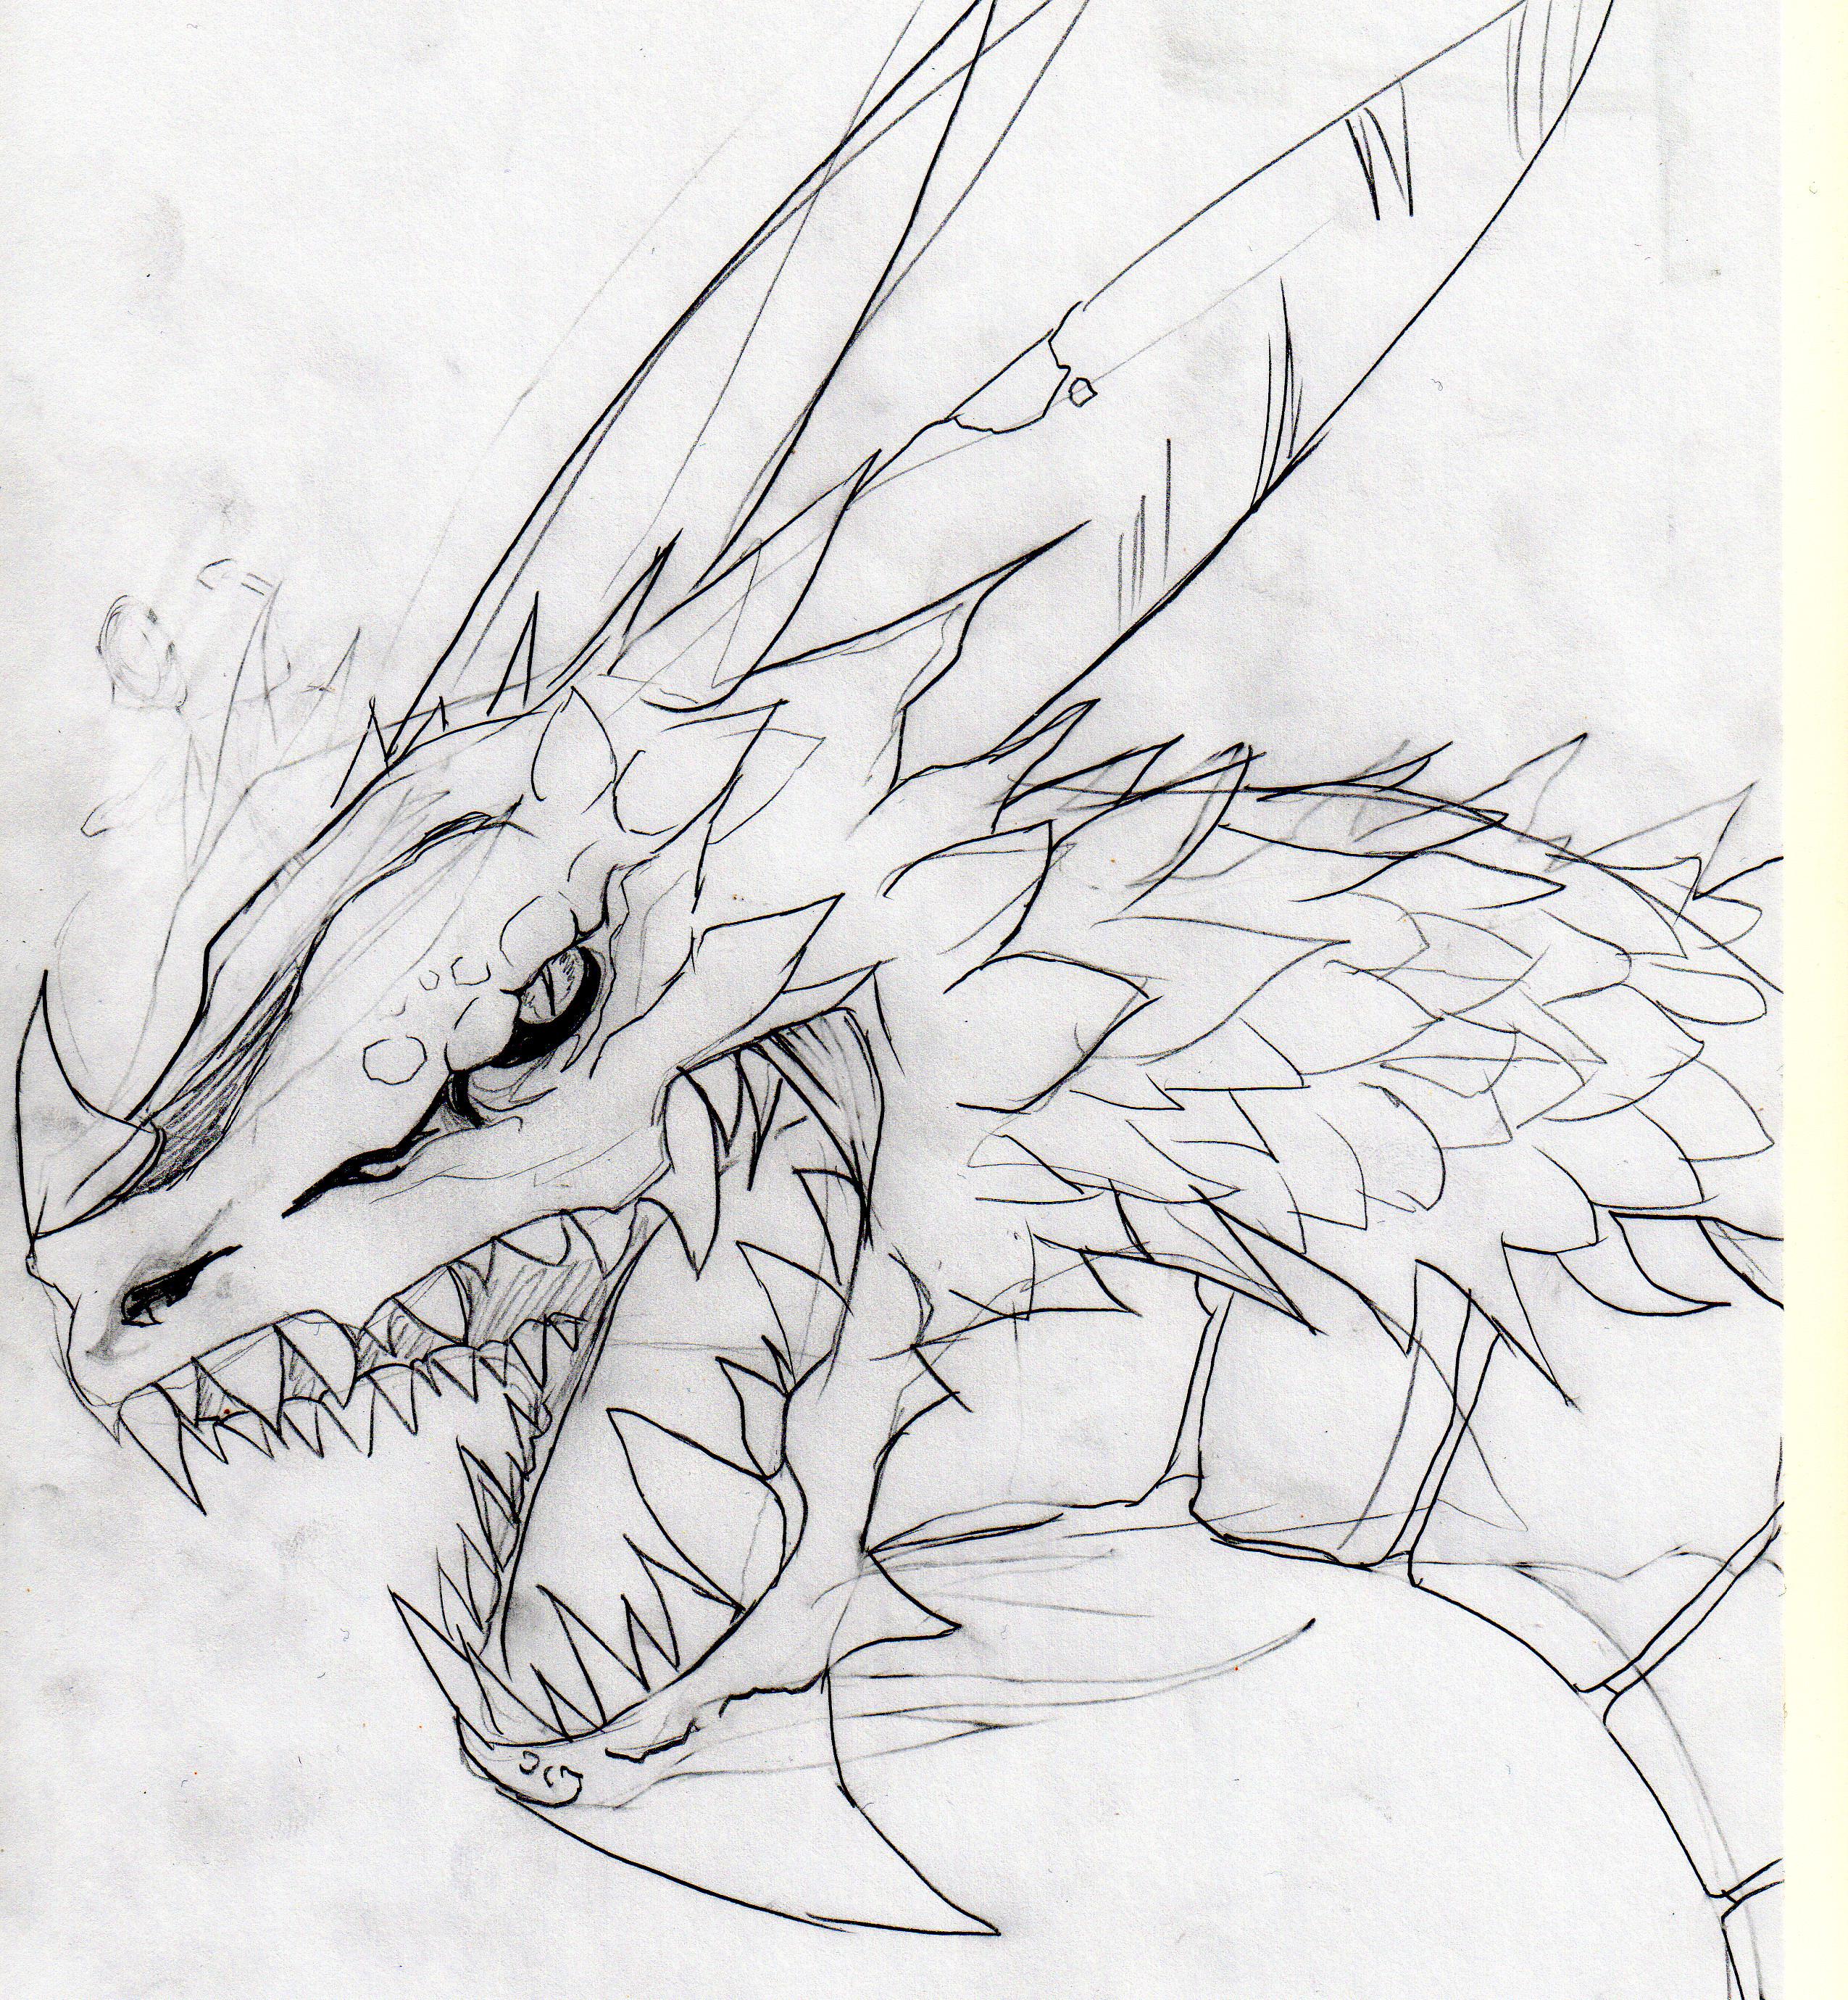 dragon draft drawing by chetz on deviantart